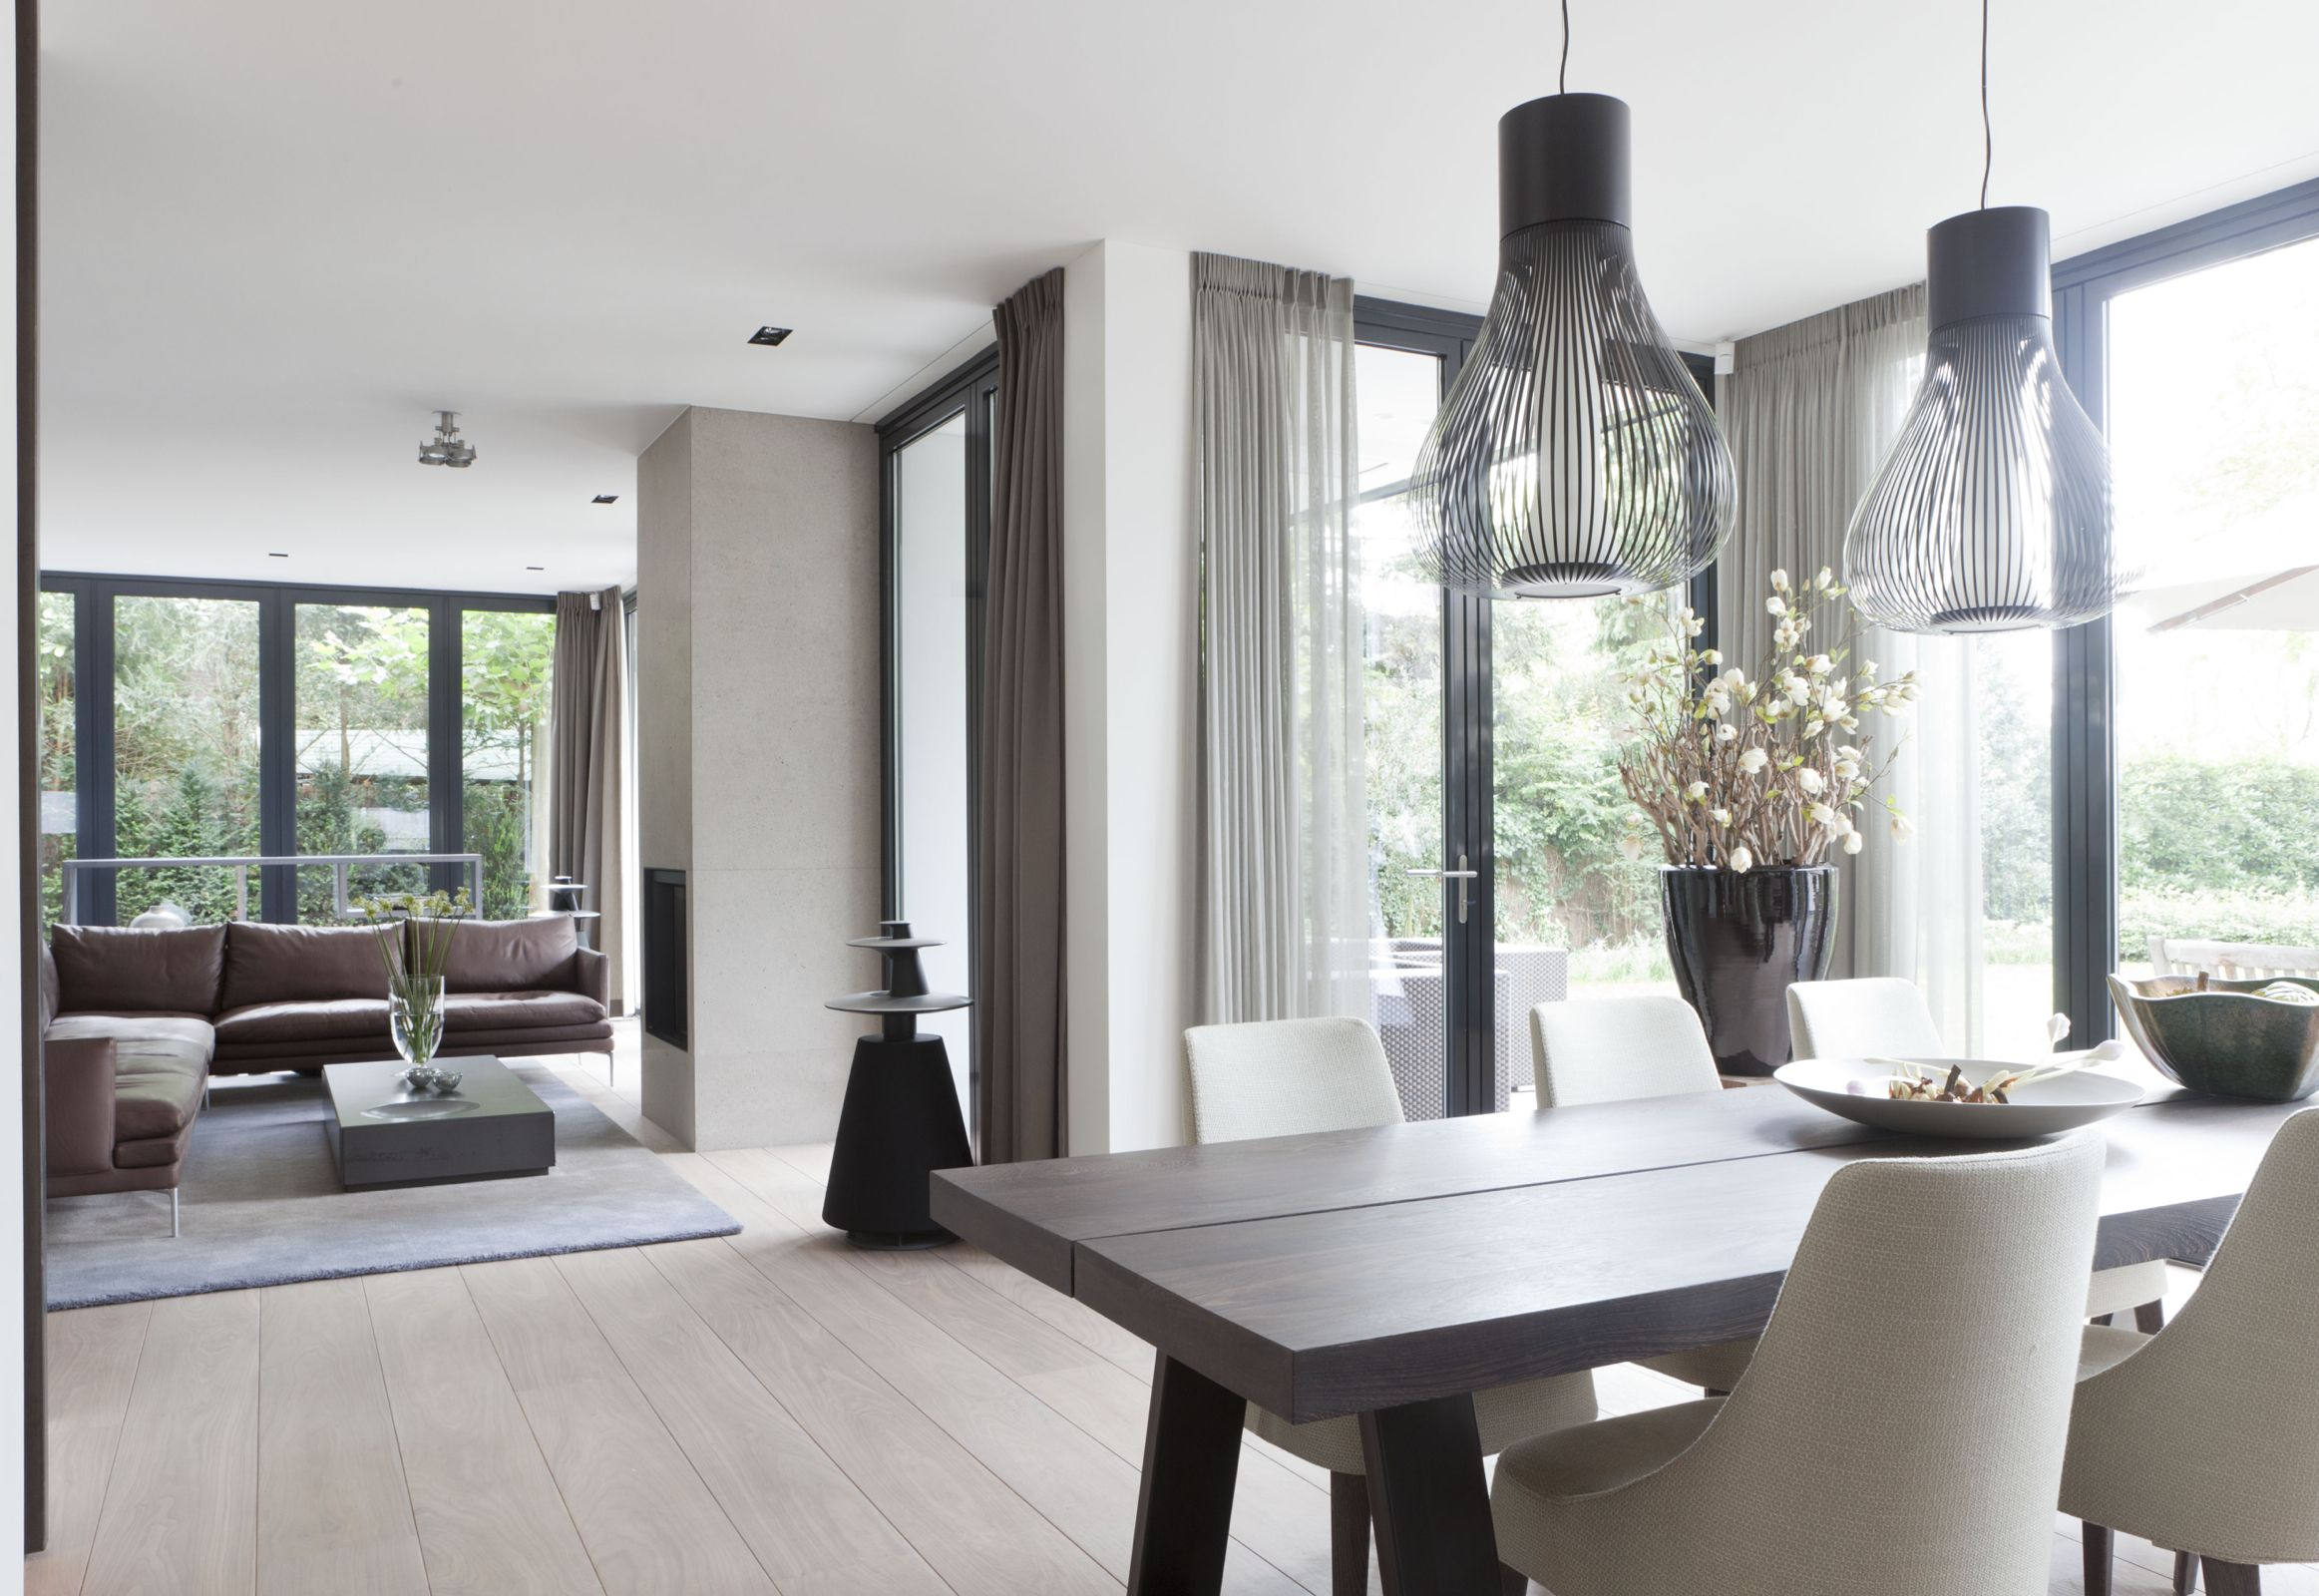 Remy meijers interieurarchitectuur villa in 39 t gooivilla in 39 t gooi remy meijers - Eigentijdse eetkamer decoratie ...